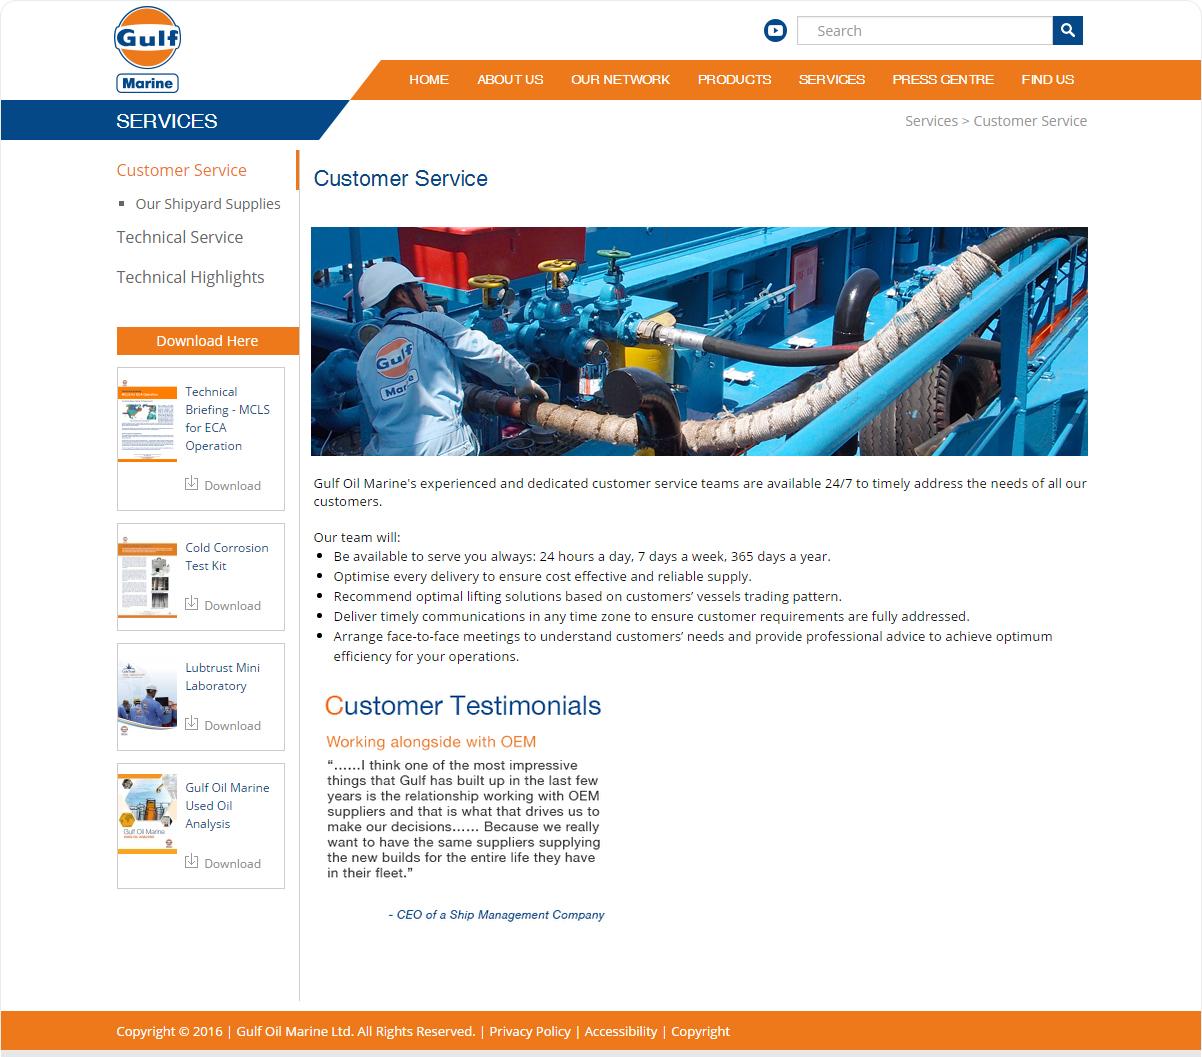 Gulf Oil Marine Ltd.